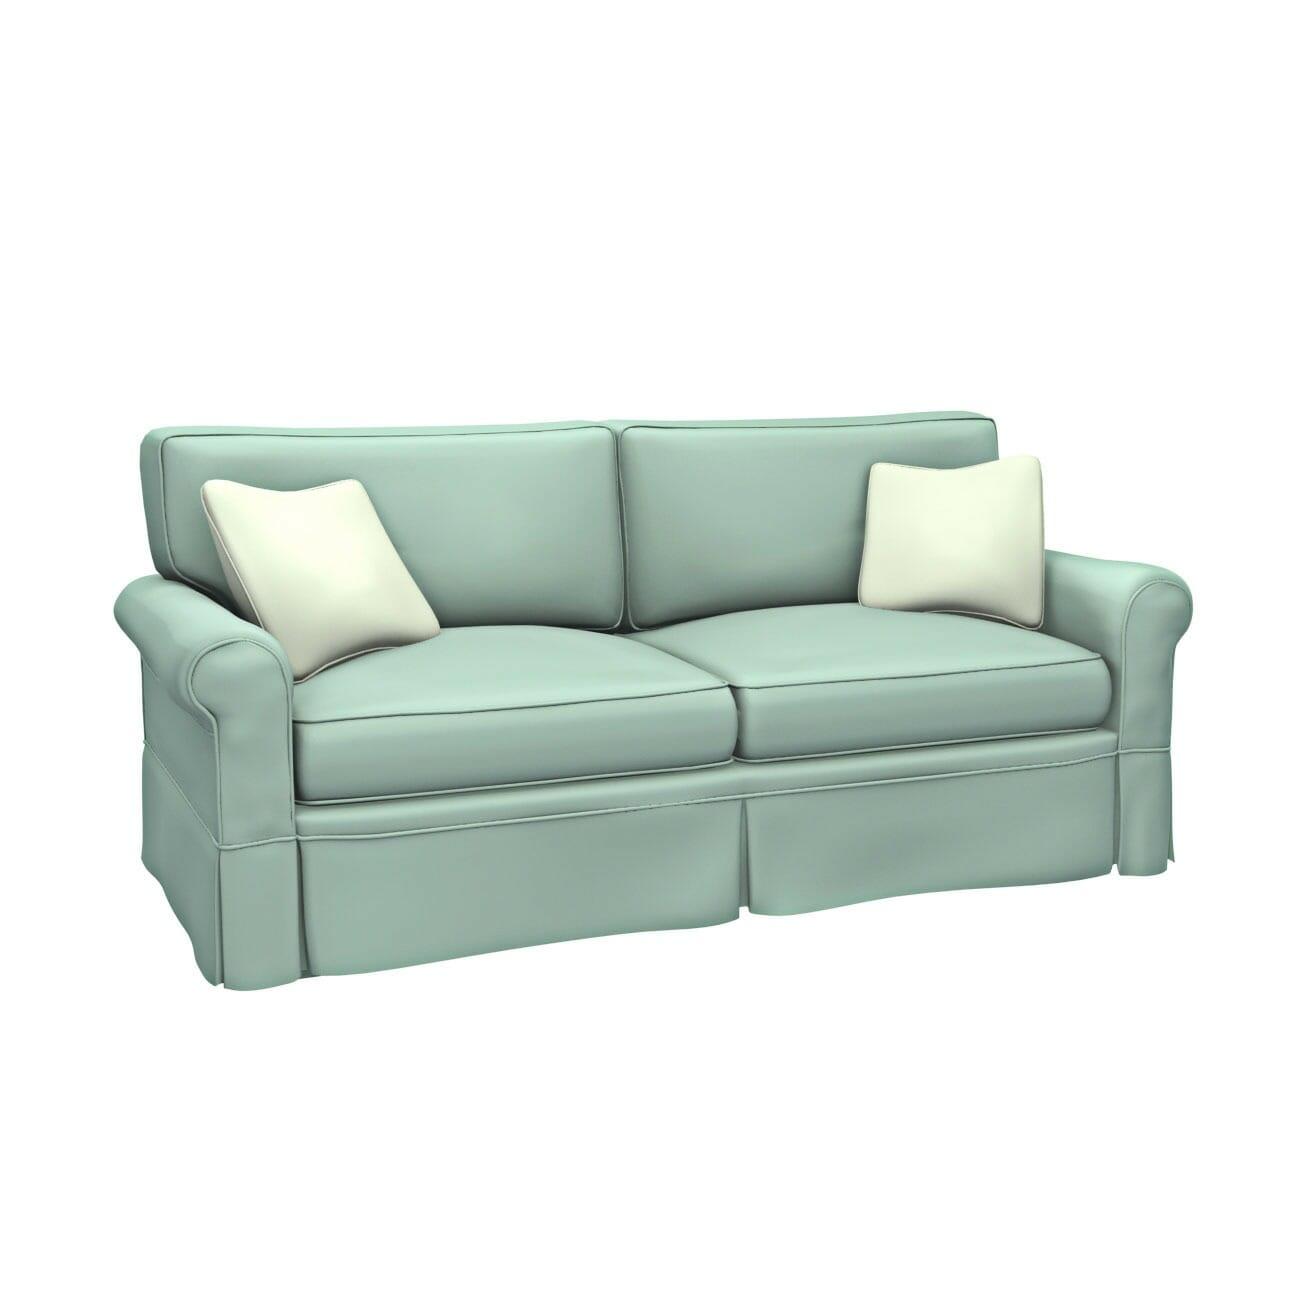 camden sofa bed custom sectional sofas toronto slipcovered cottage home